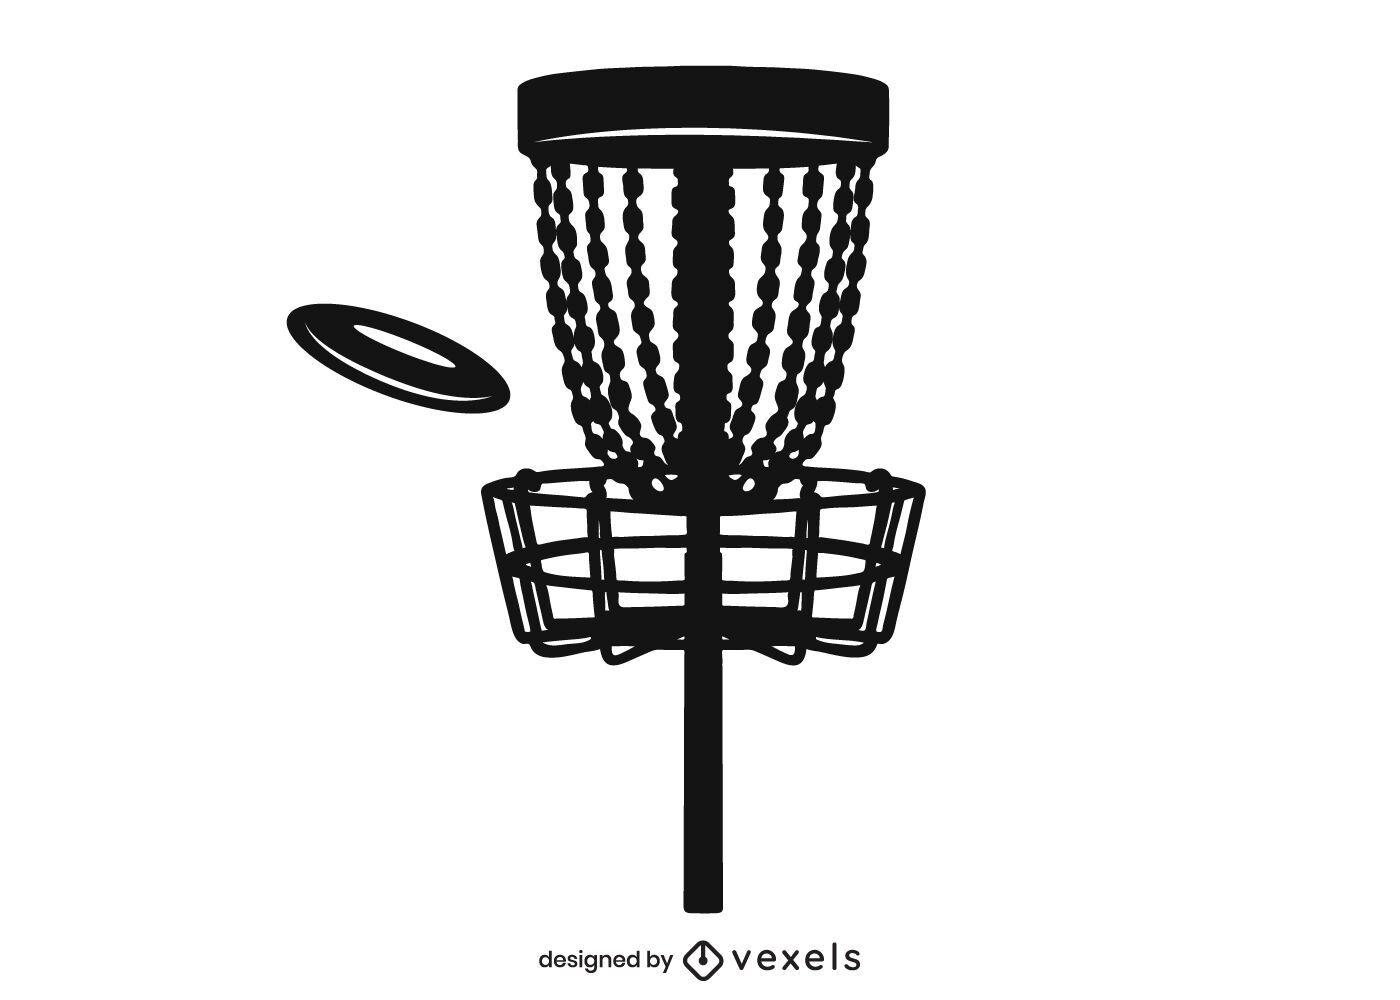 Disc golf basket silhouette design